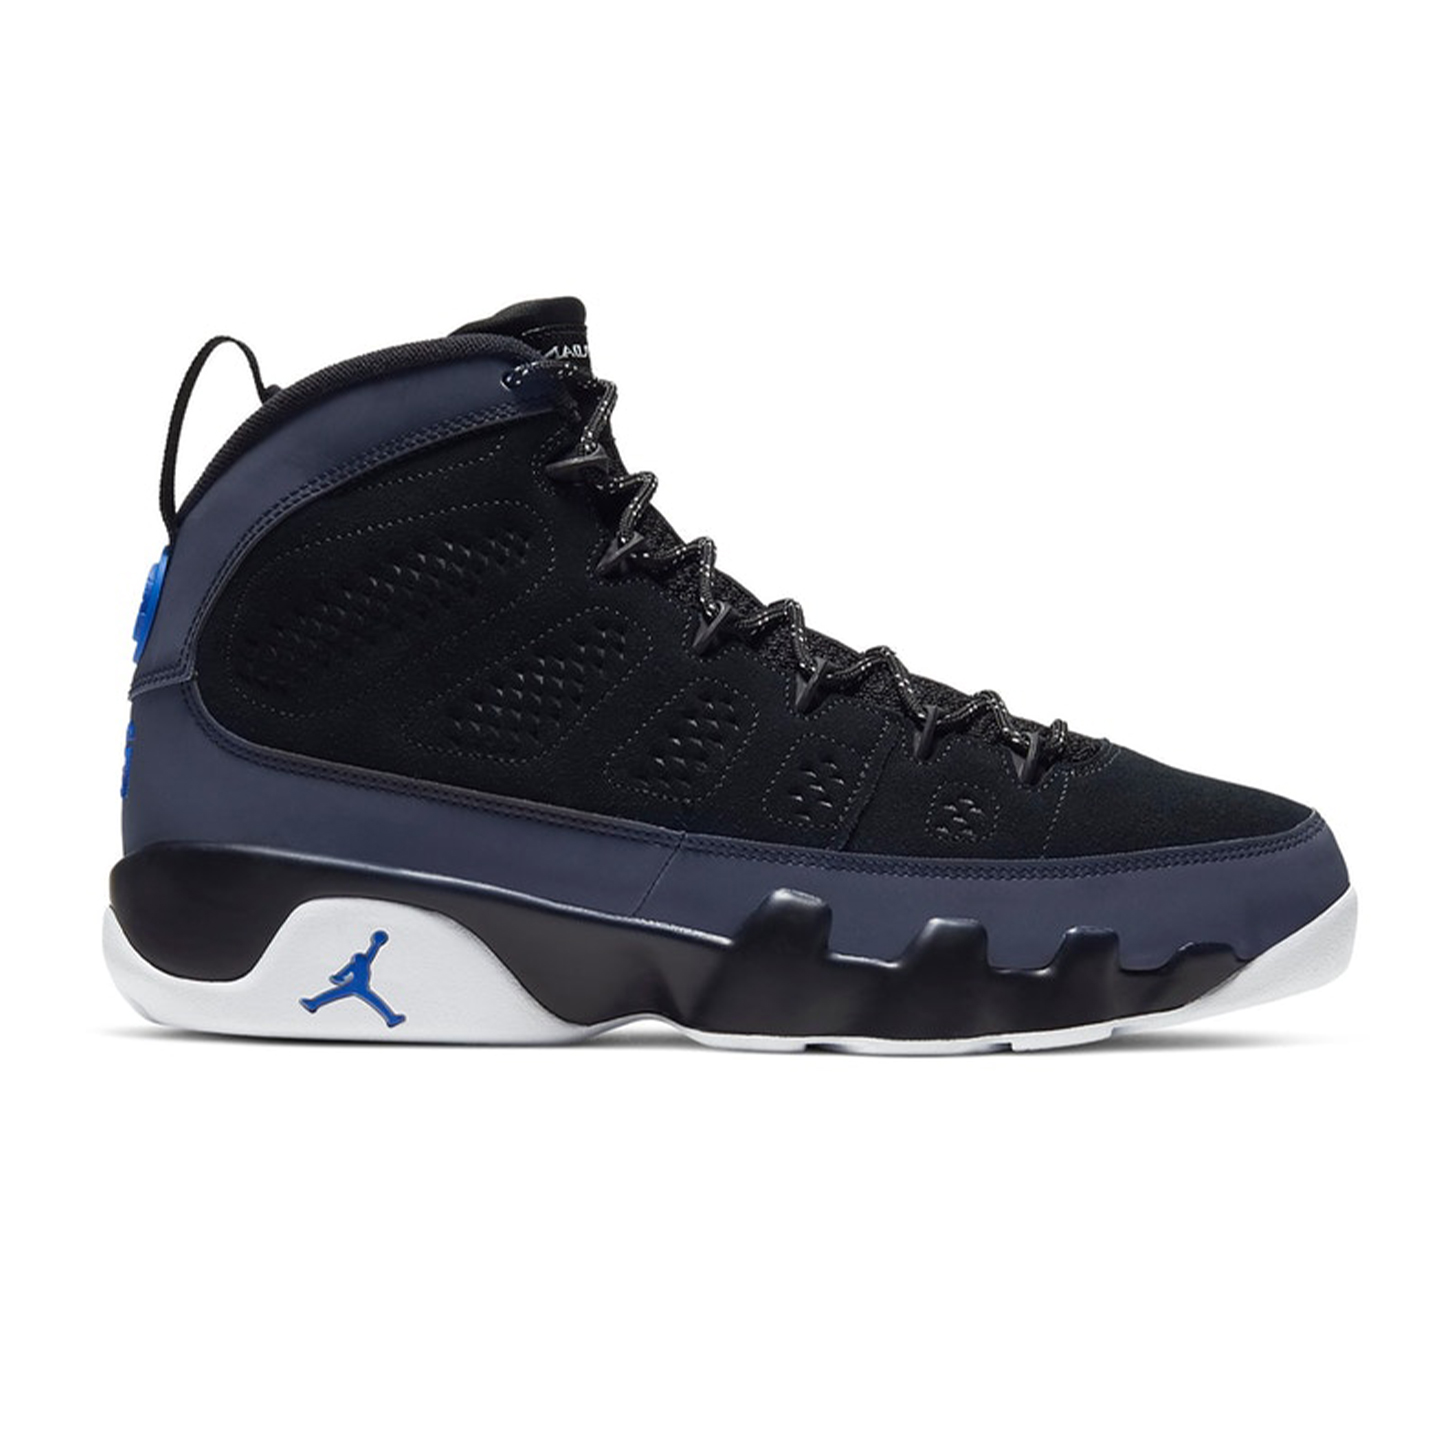 Air-Jordan-9-Retro-Racer-Blue